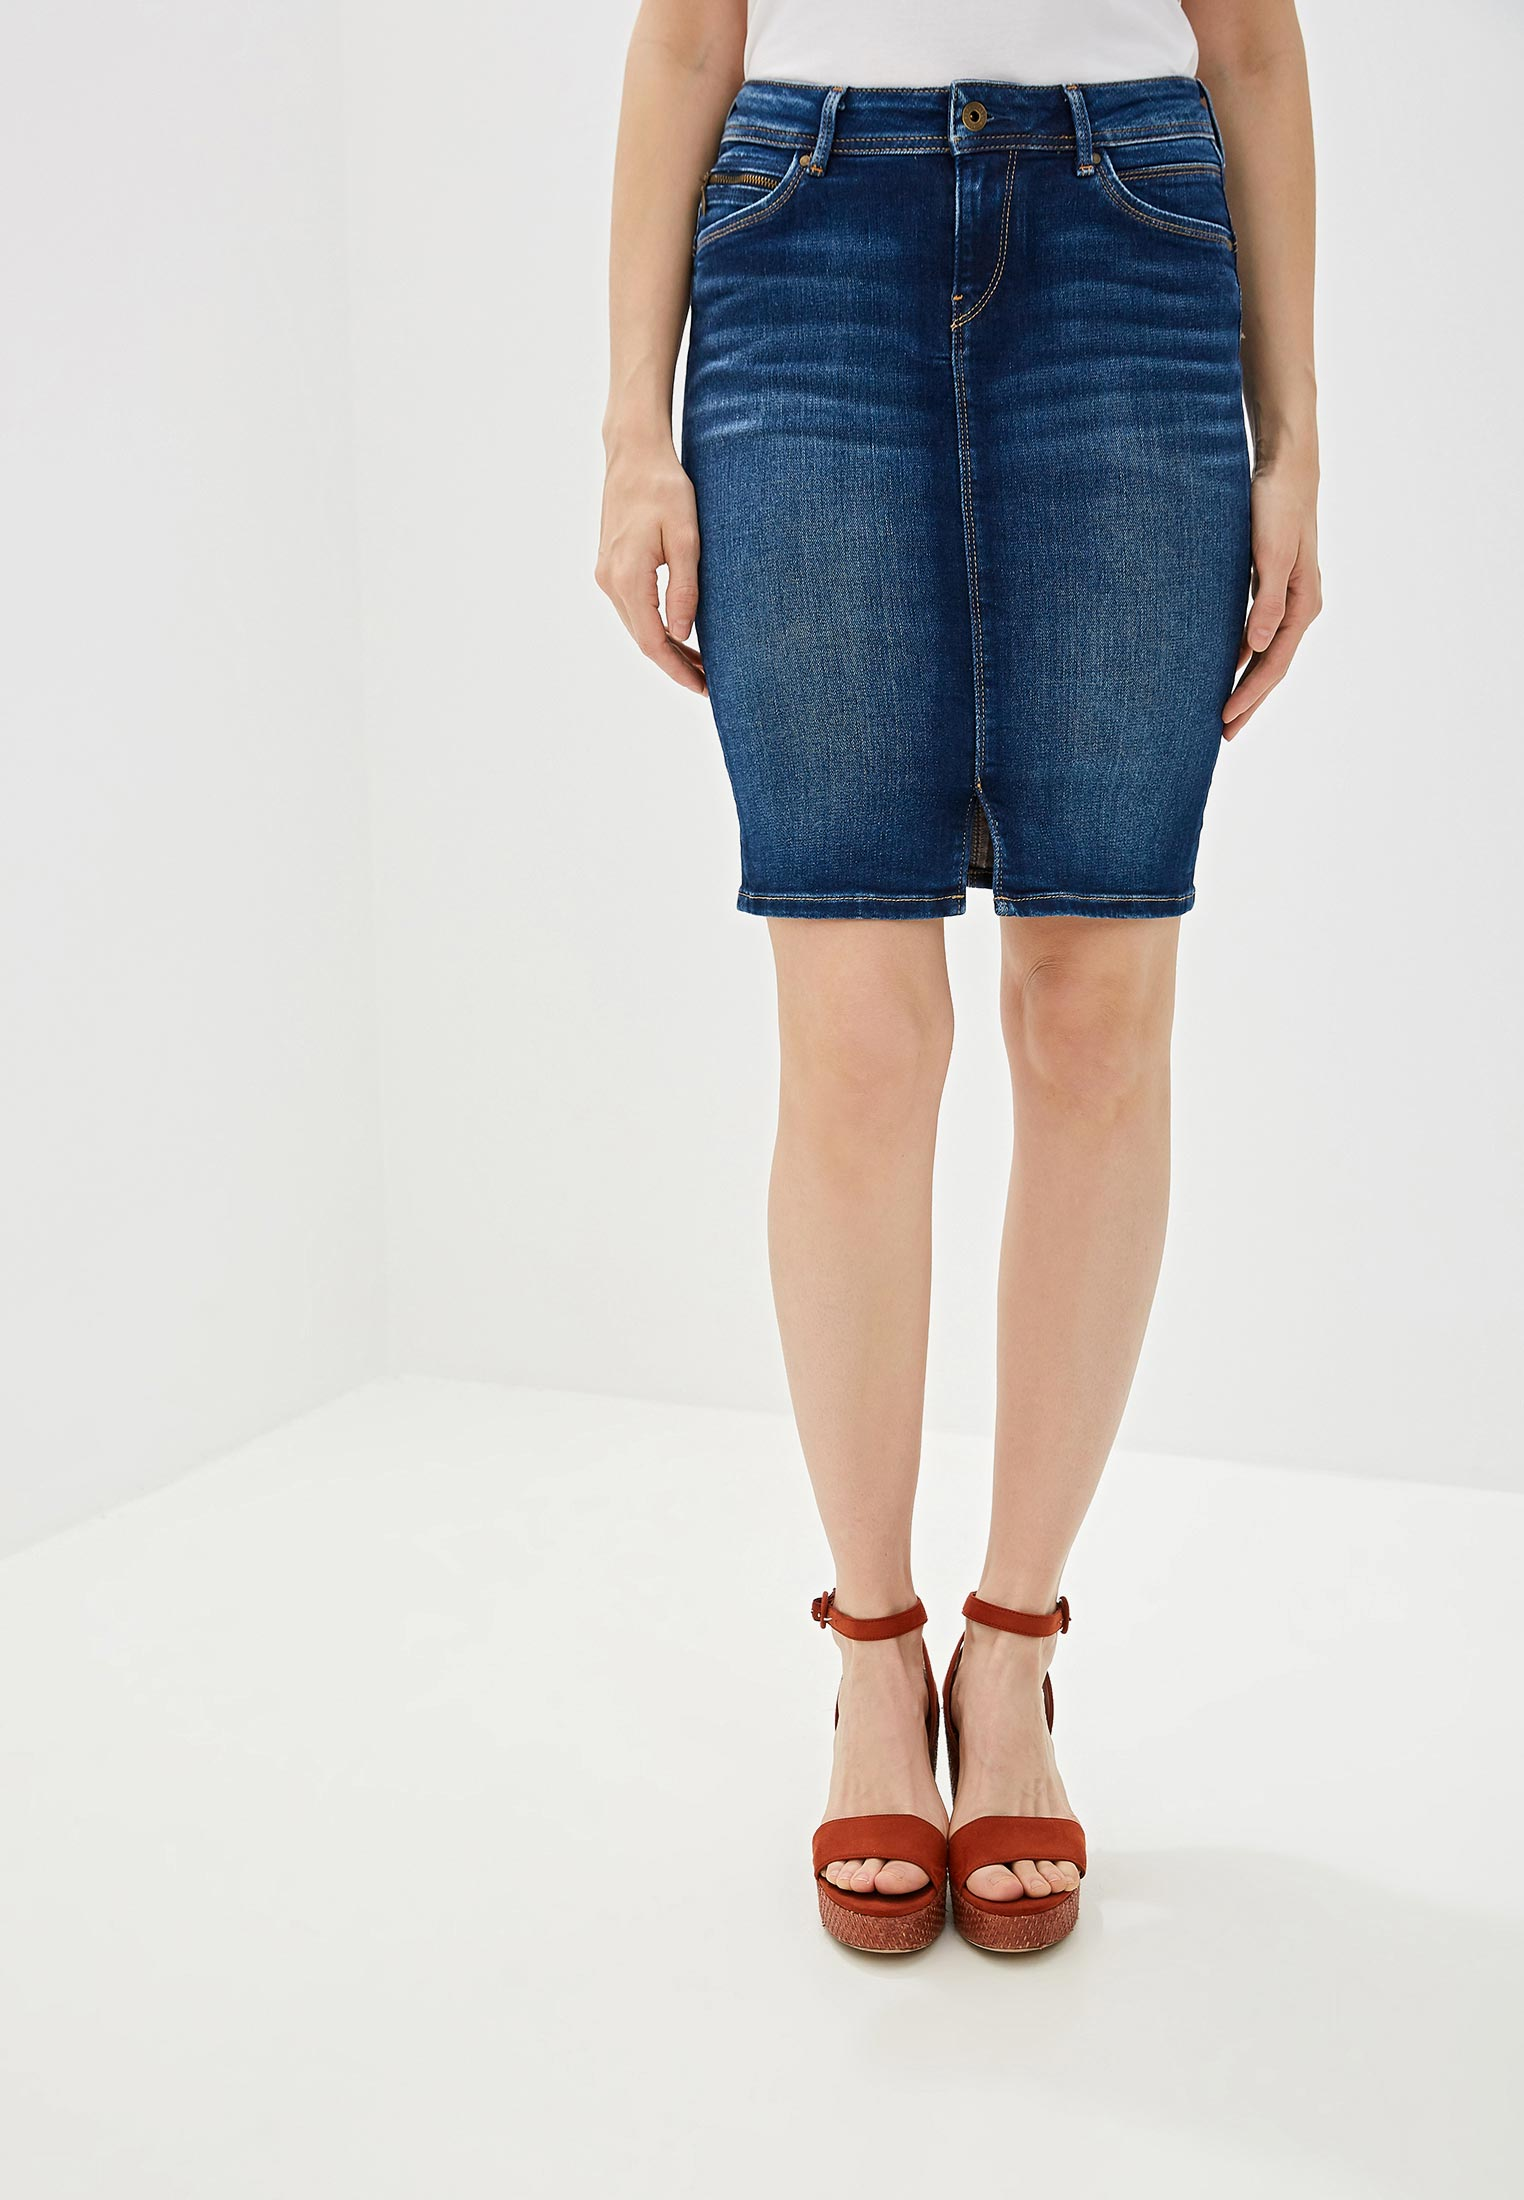 Джинсовая юбка Pepe Jeans (Пепе Джинс) PL900443DB4